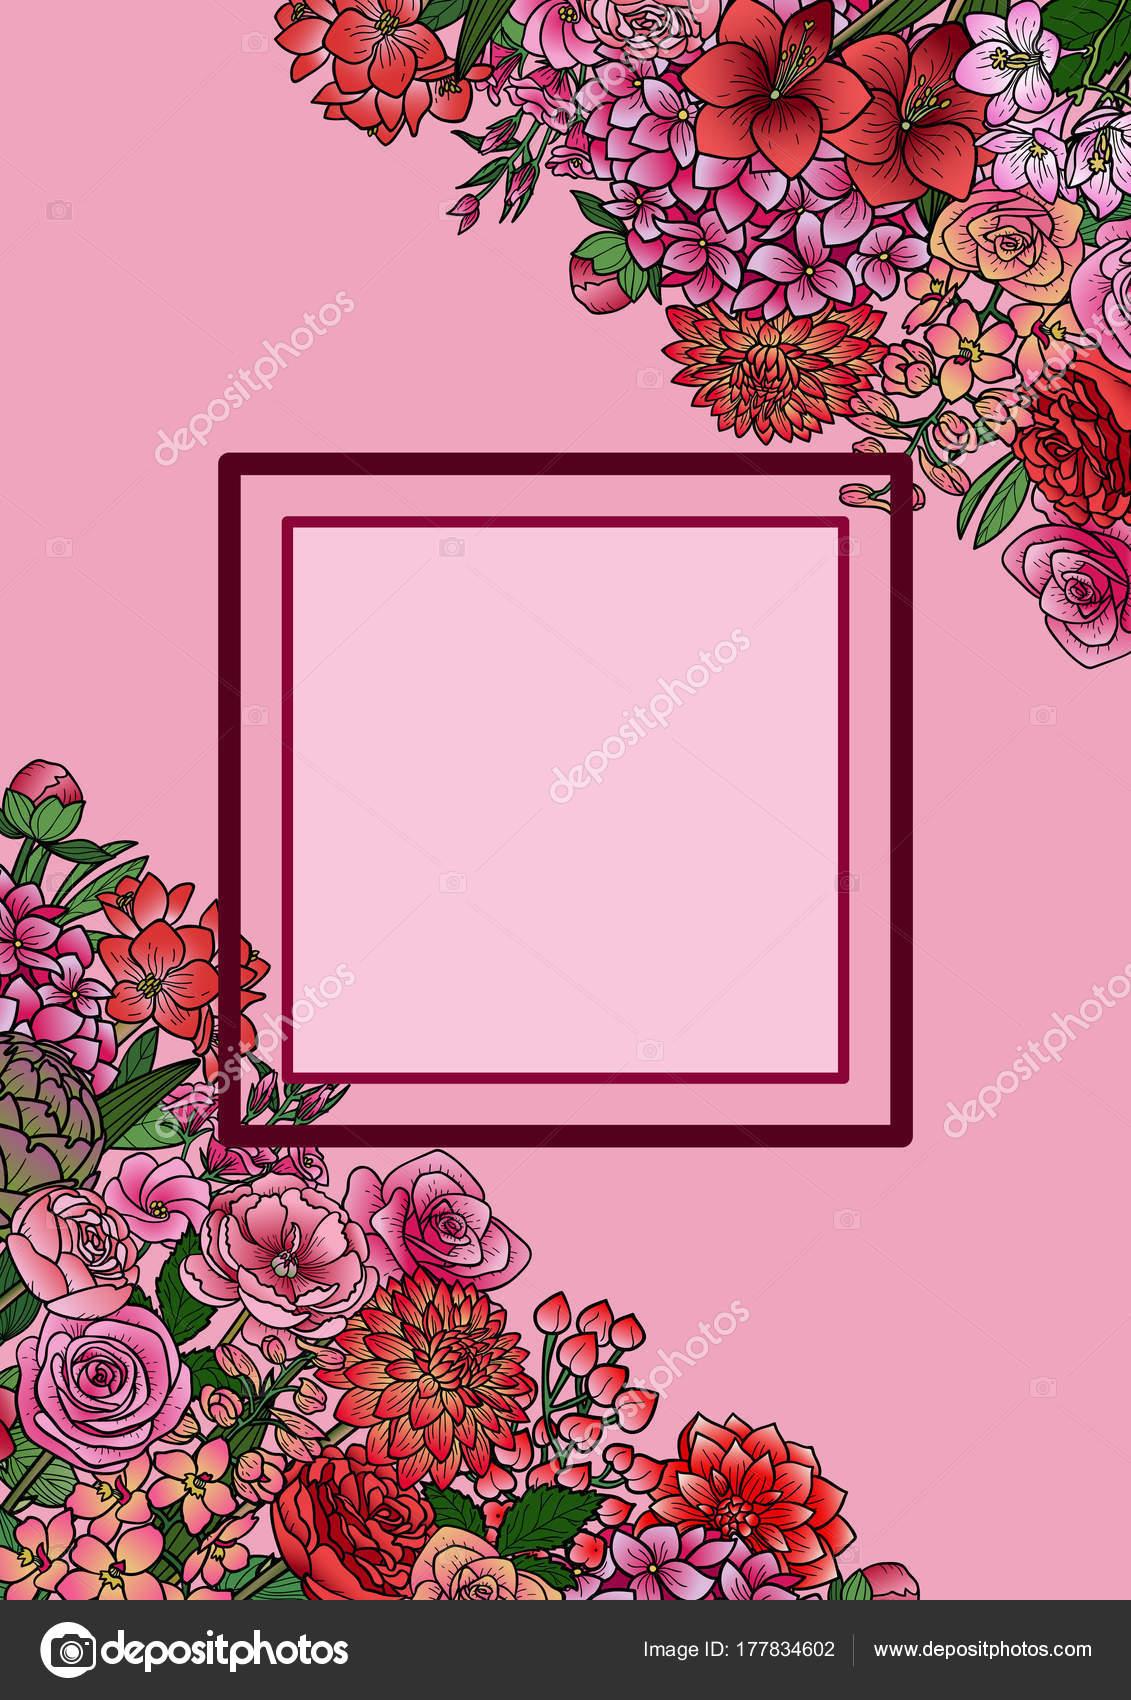 Garten Blumen Mock-Up Rahmen — Stockvektor © KronaLux #177834602